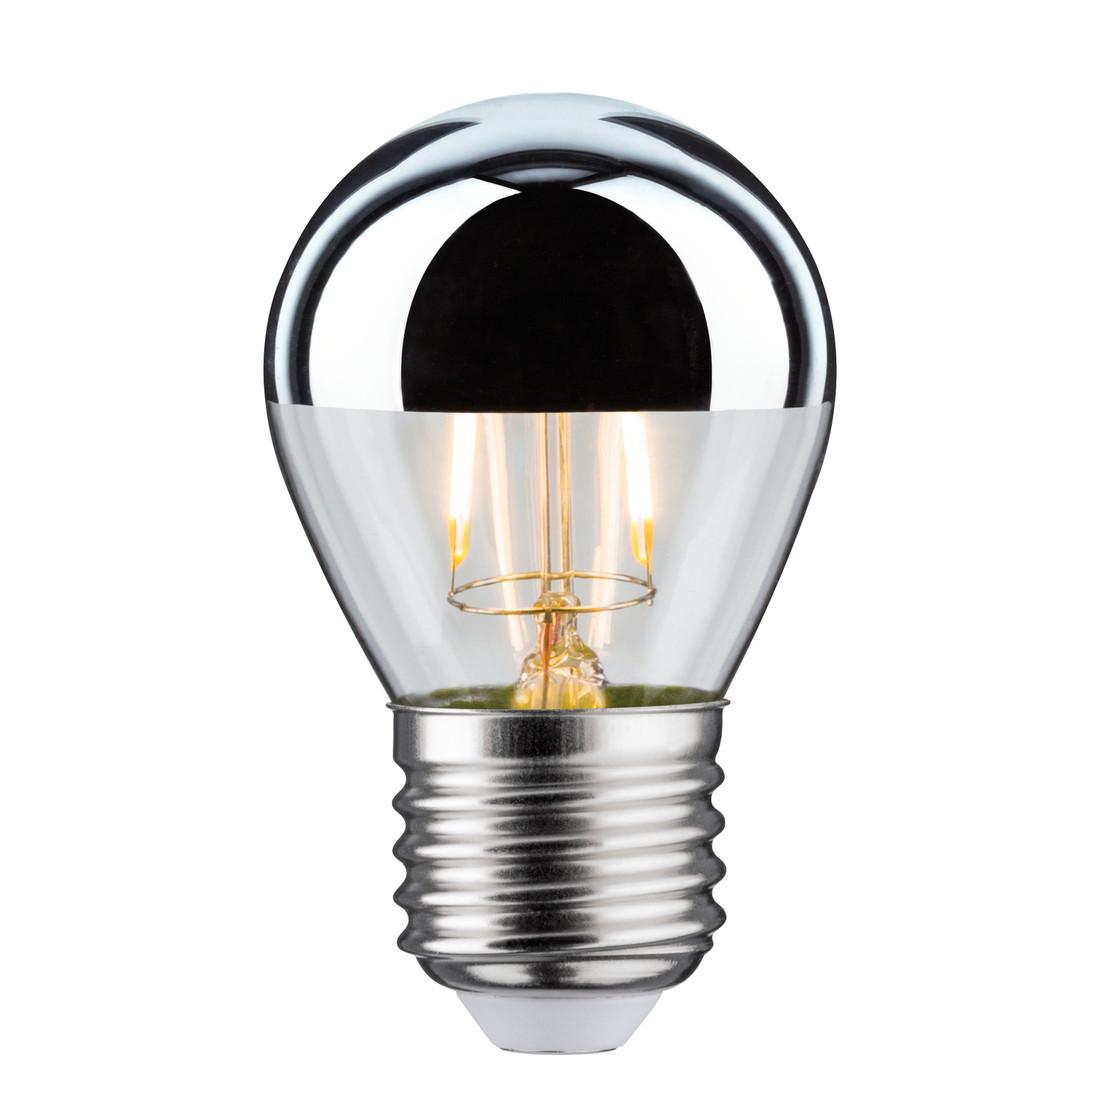 paulmann led filament retro kopfspiegel tropfen 2 5w e27 warmw 7 99. Black Bedroom Furniture Sets. Home Design Ideas